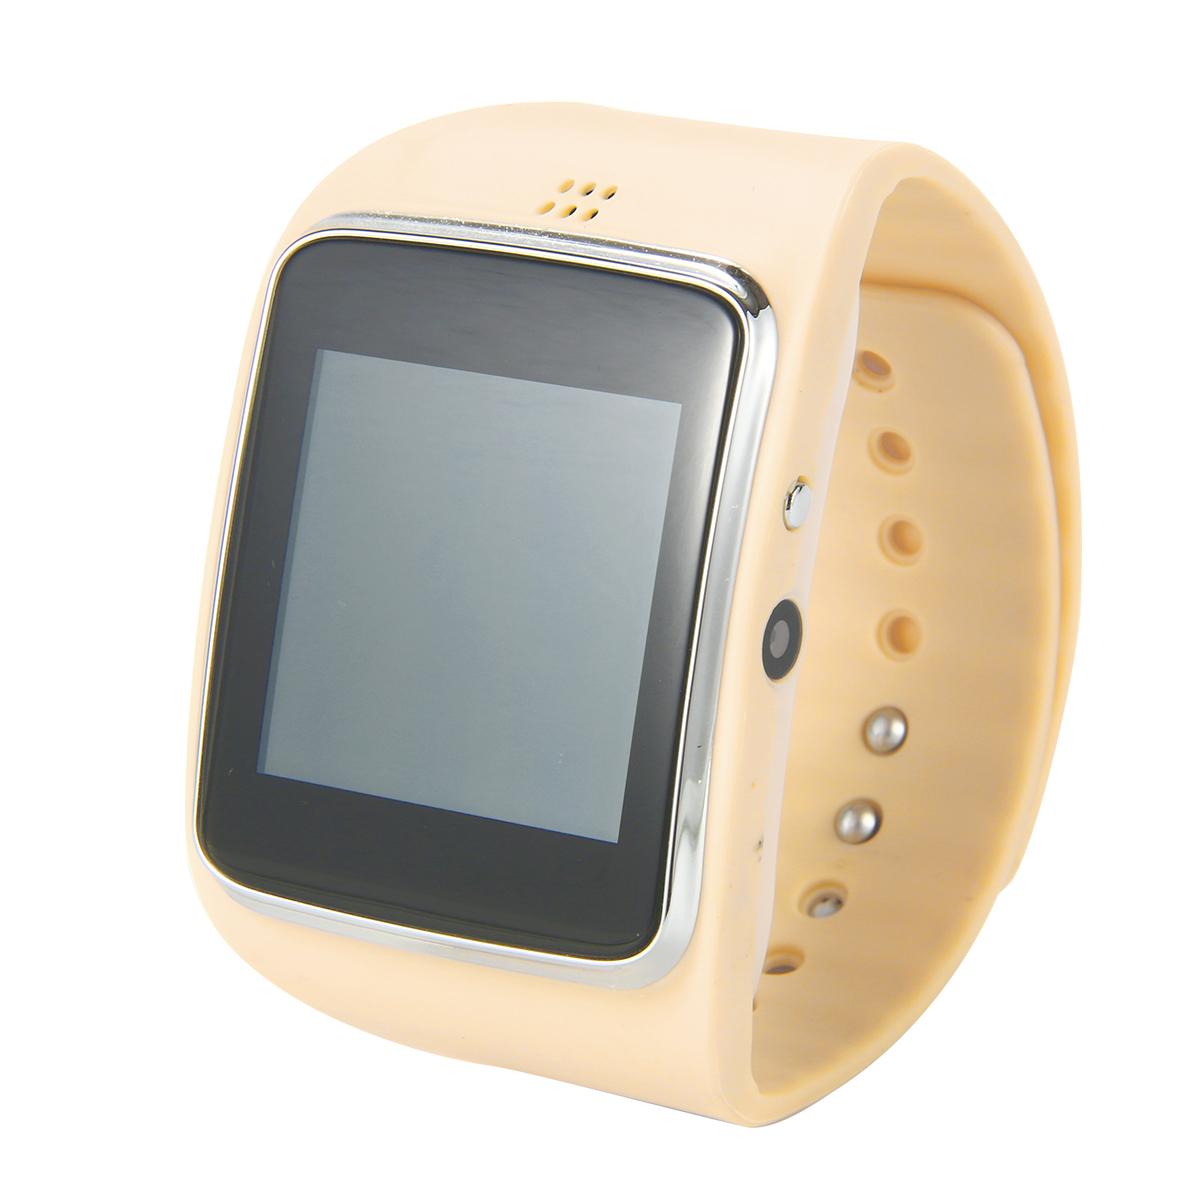 Bluetooth 3.0 Smart Wrist Watch + 0.3 MP Camera For iPhone 5 5S 6 Plus IOS AC260-SZ<br><br>Aliexpress